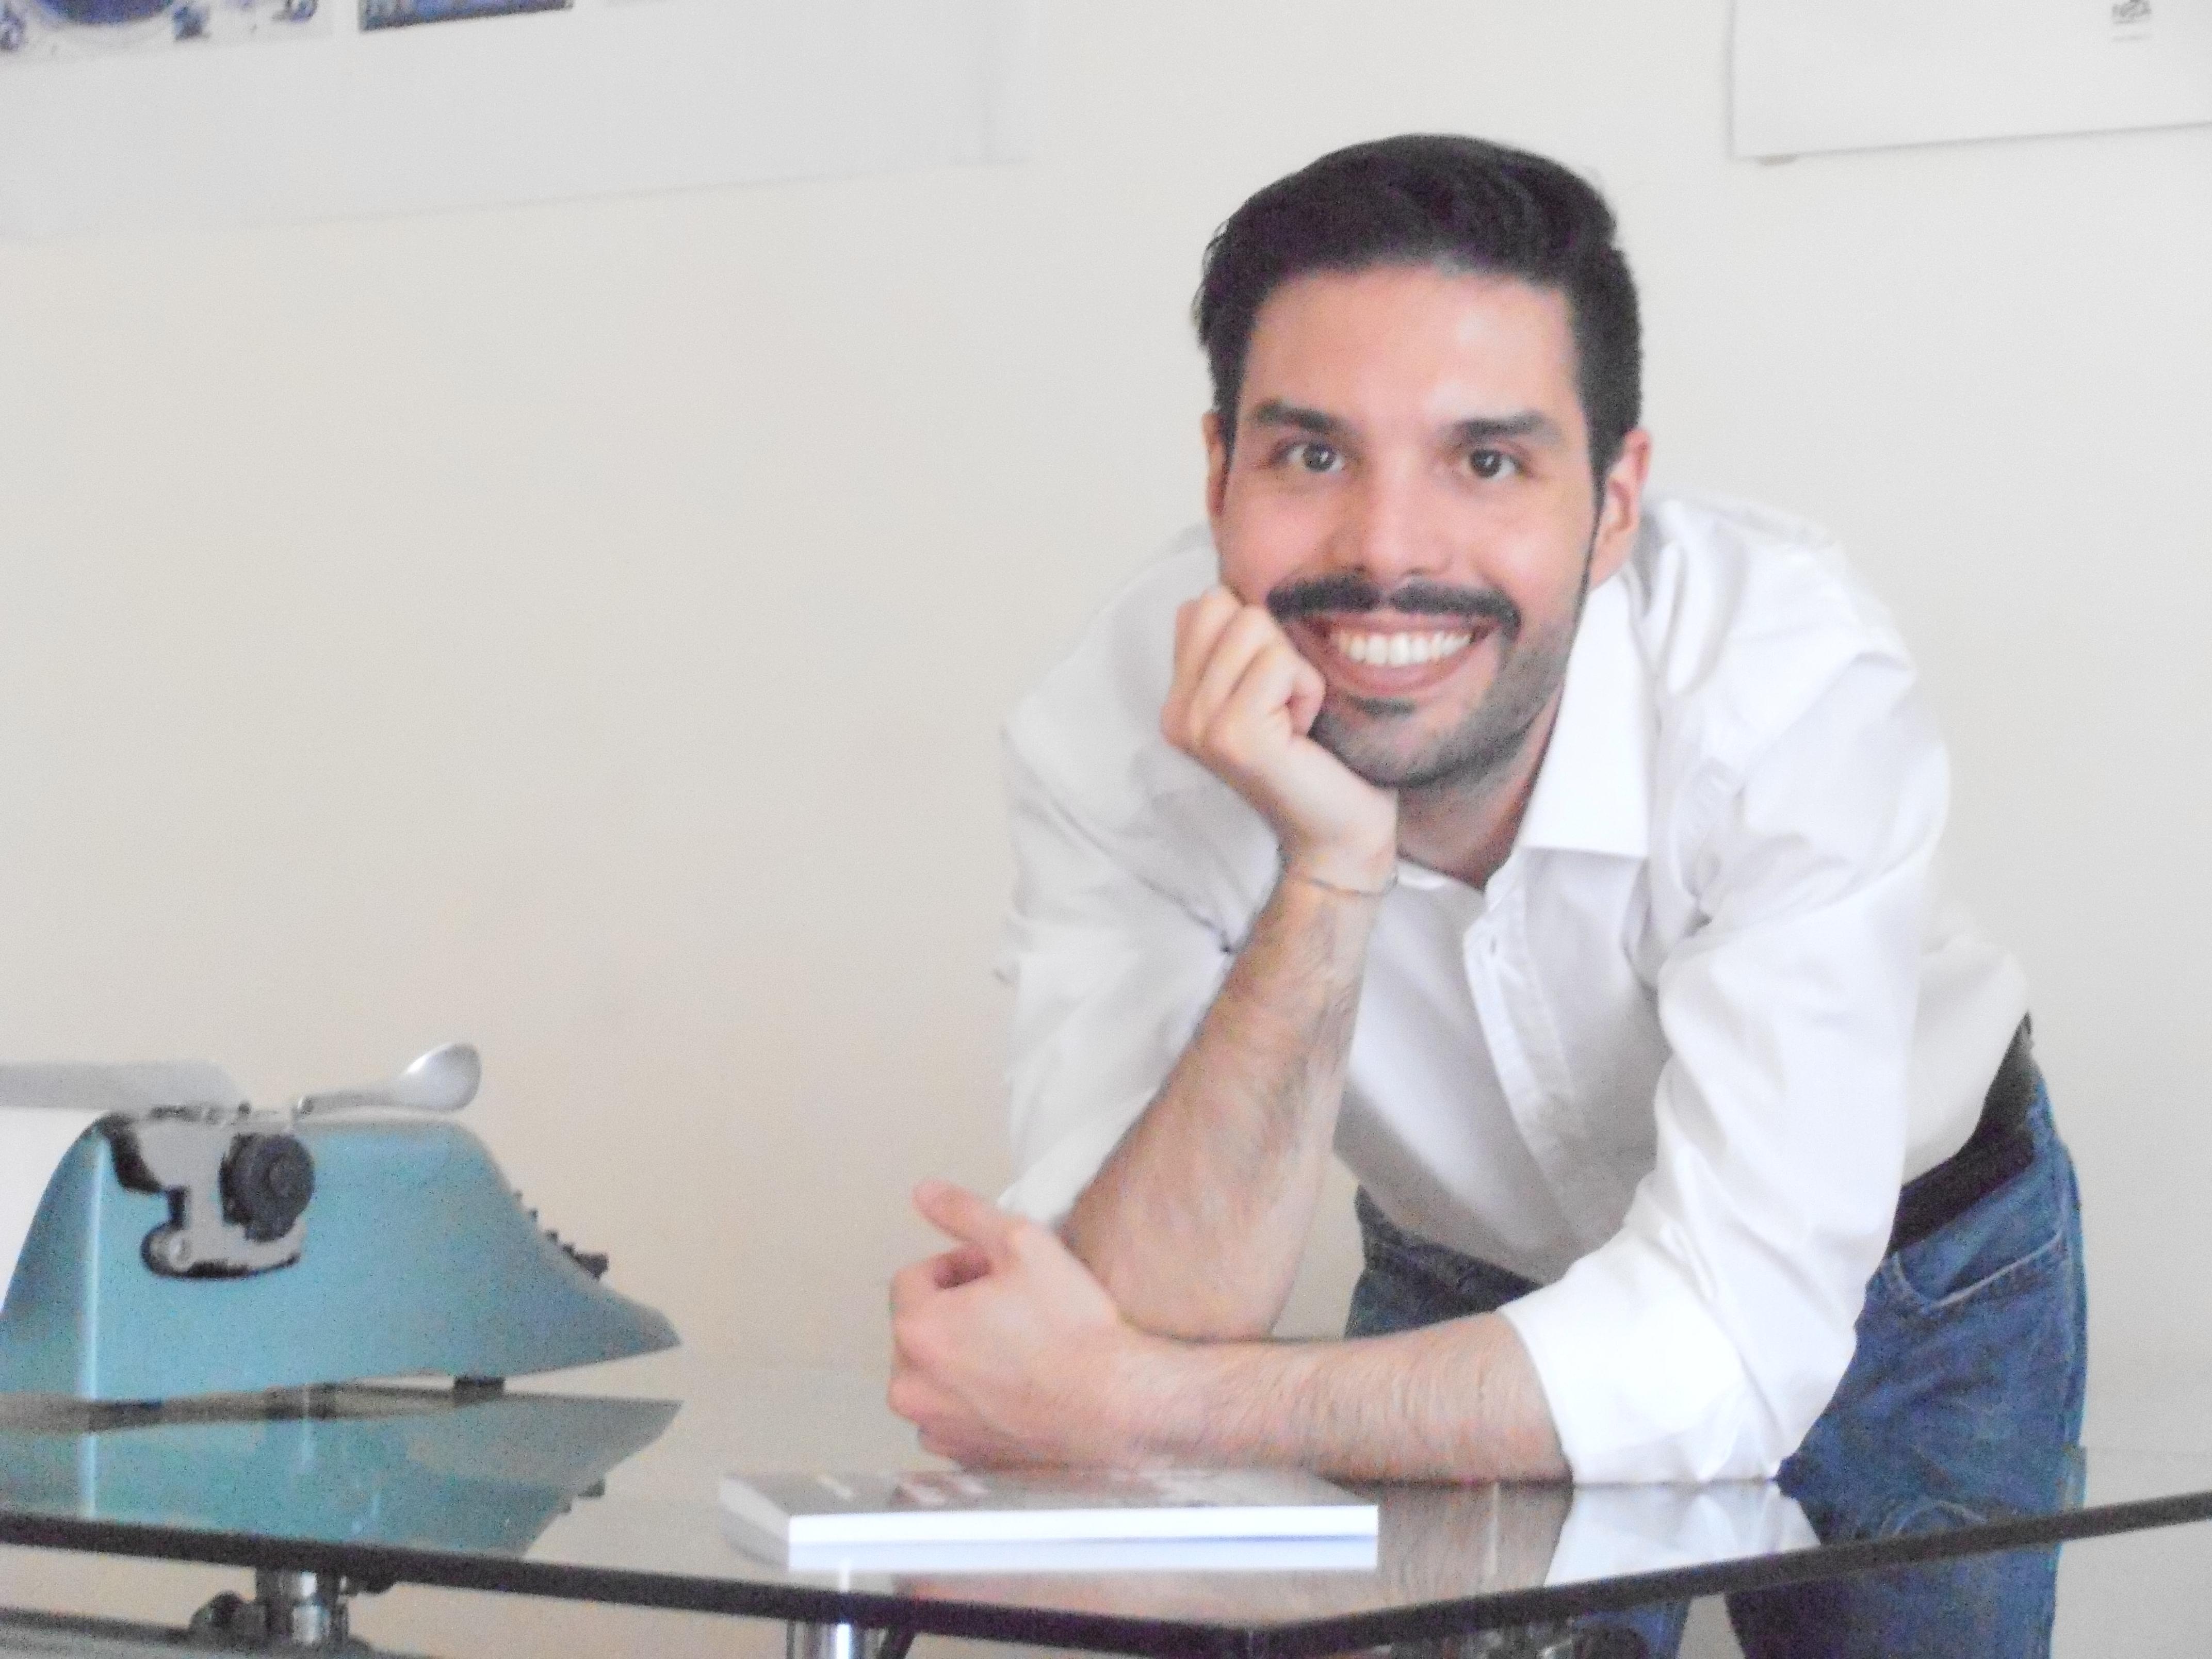 Michael Floris